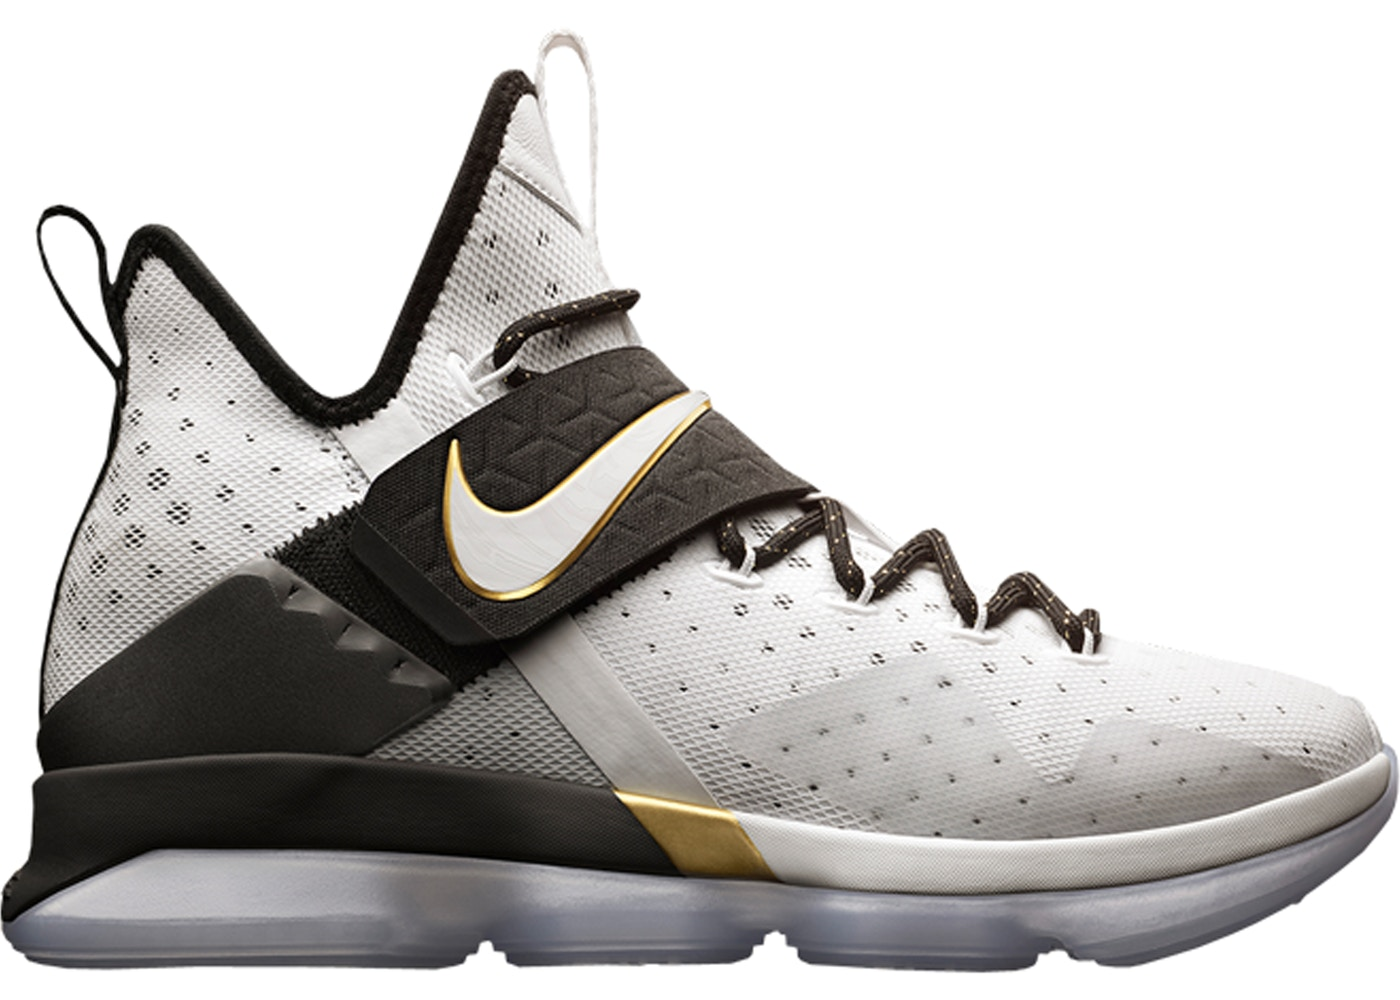 5bfcf0b0b5f Nike LeBron 14 Shoes - Last Sale